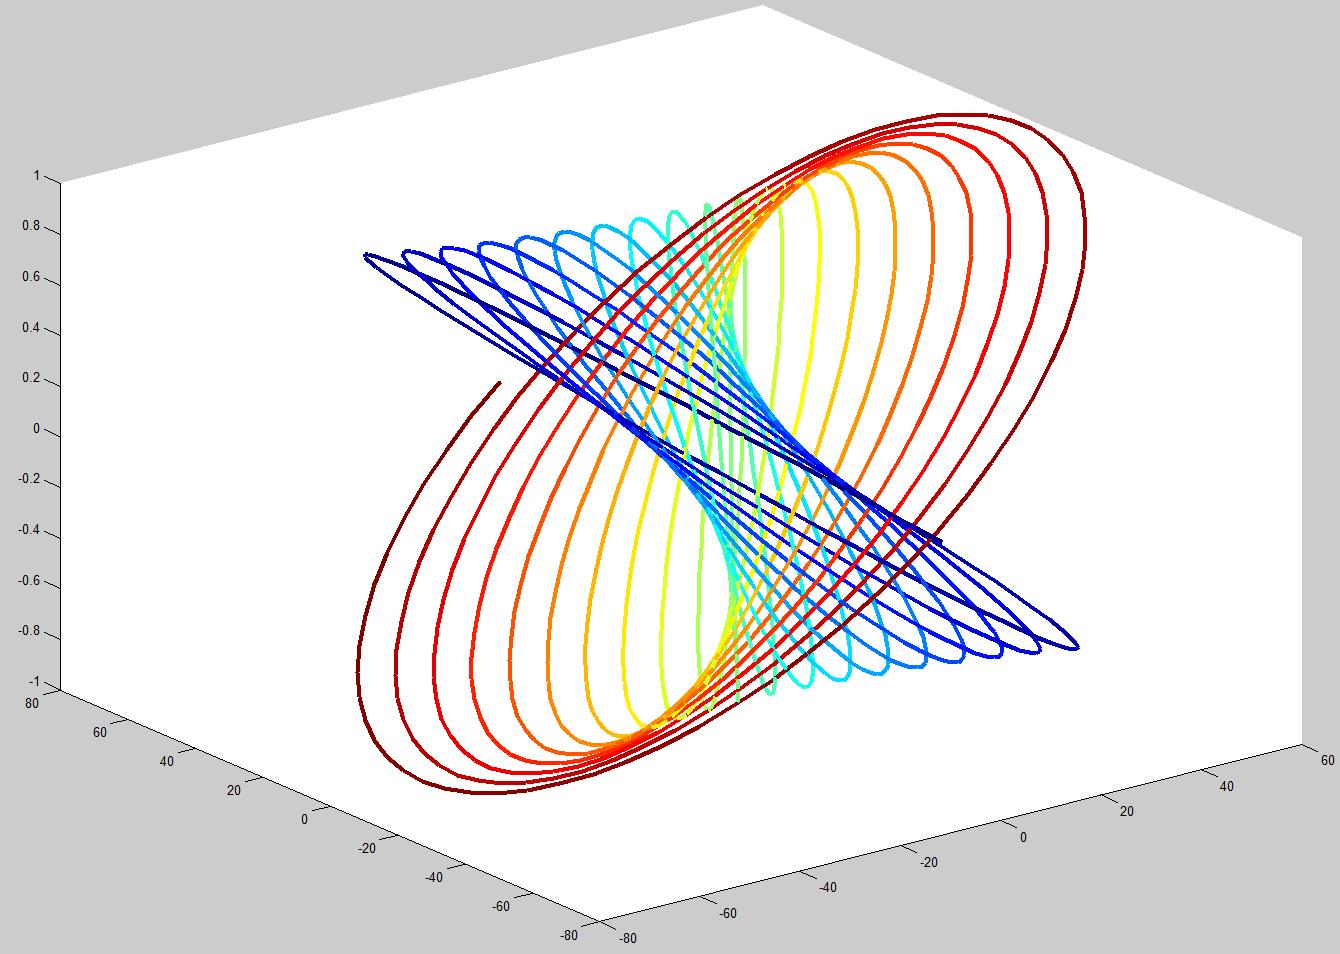 colormapline - color-changing 2d or 3d line - file exchange - matlab